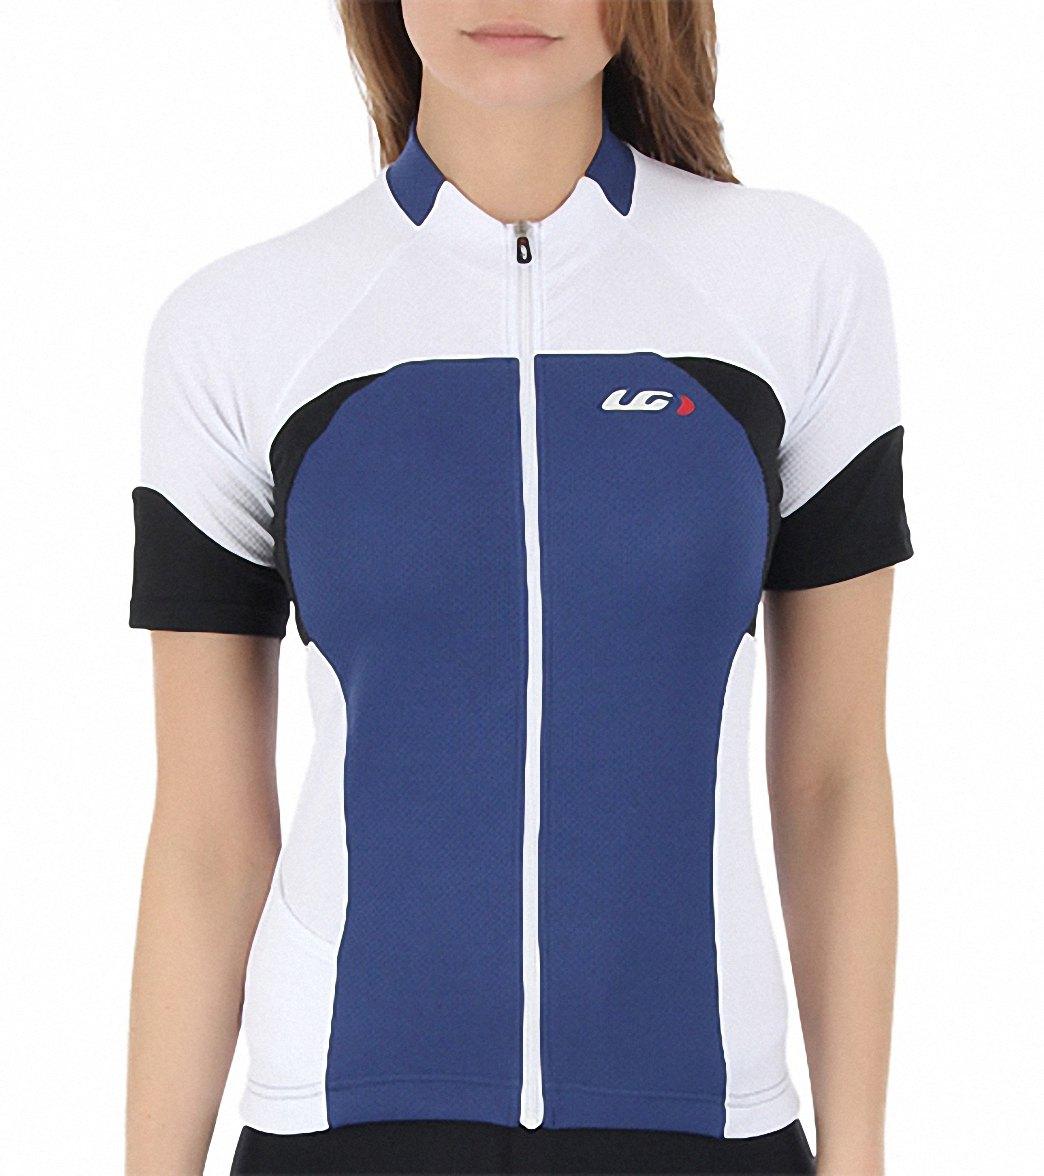 Louis Garneau Women s Metz Cycling Jersey at SwimOutlet.com ... 33f382496